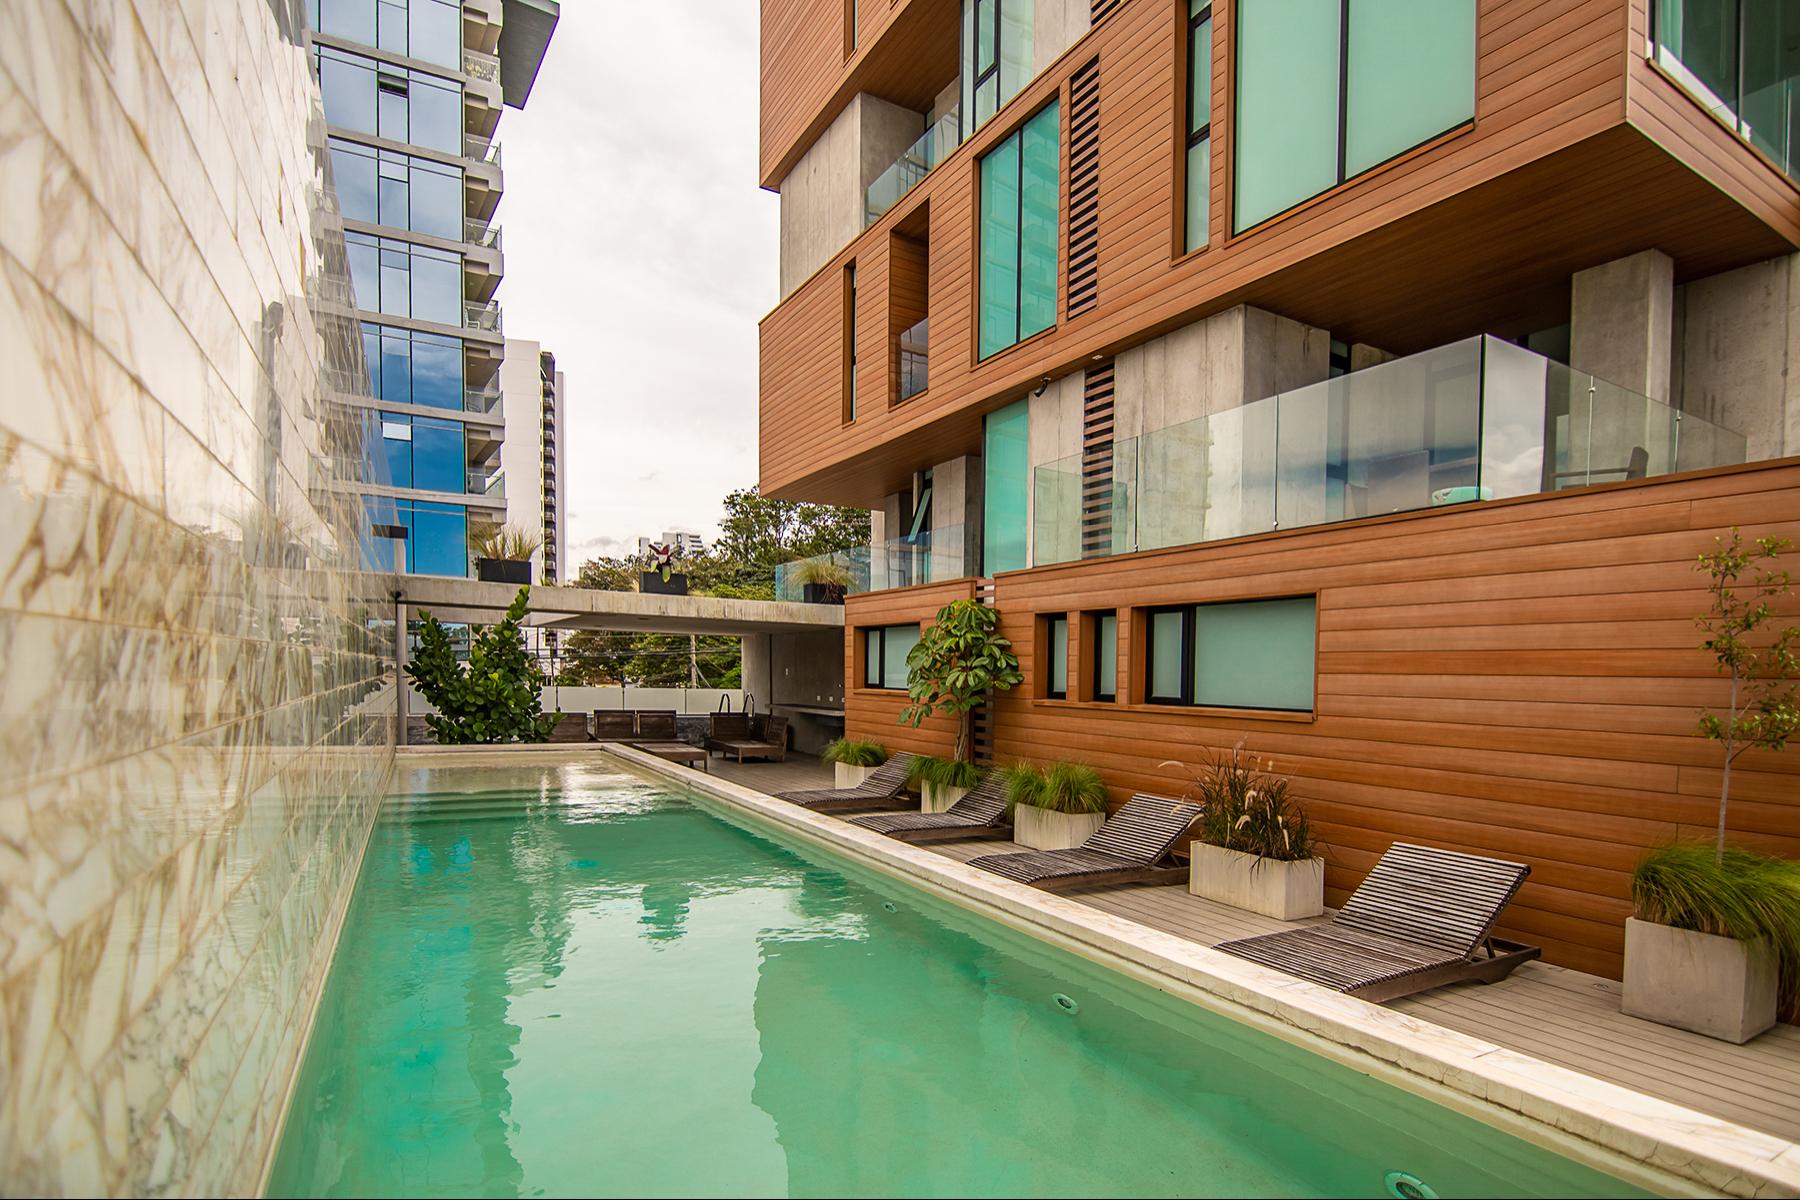 Apartments for Sale at ONE 5A, Rohrmoser Aparment Rohrmoser, San Jose Costa Rica